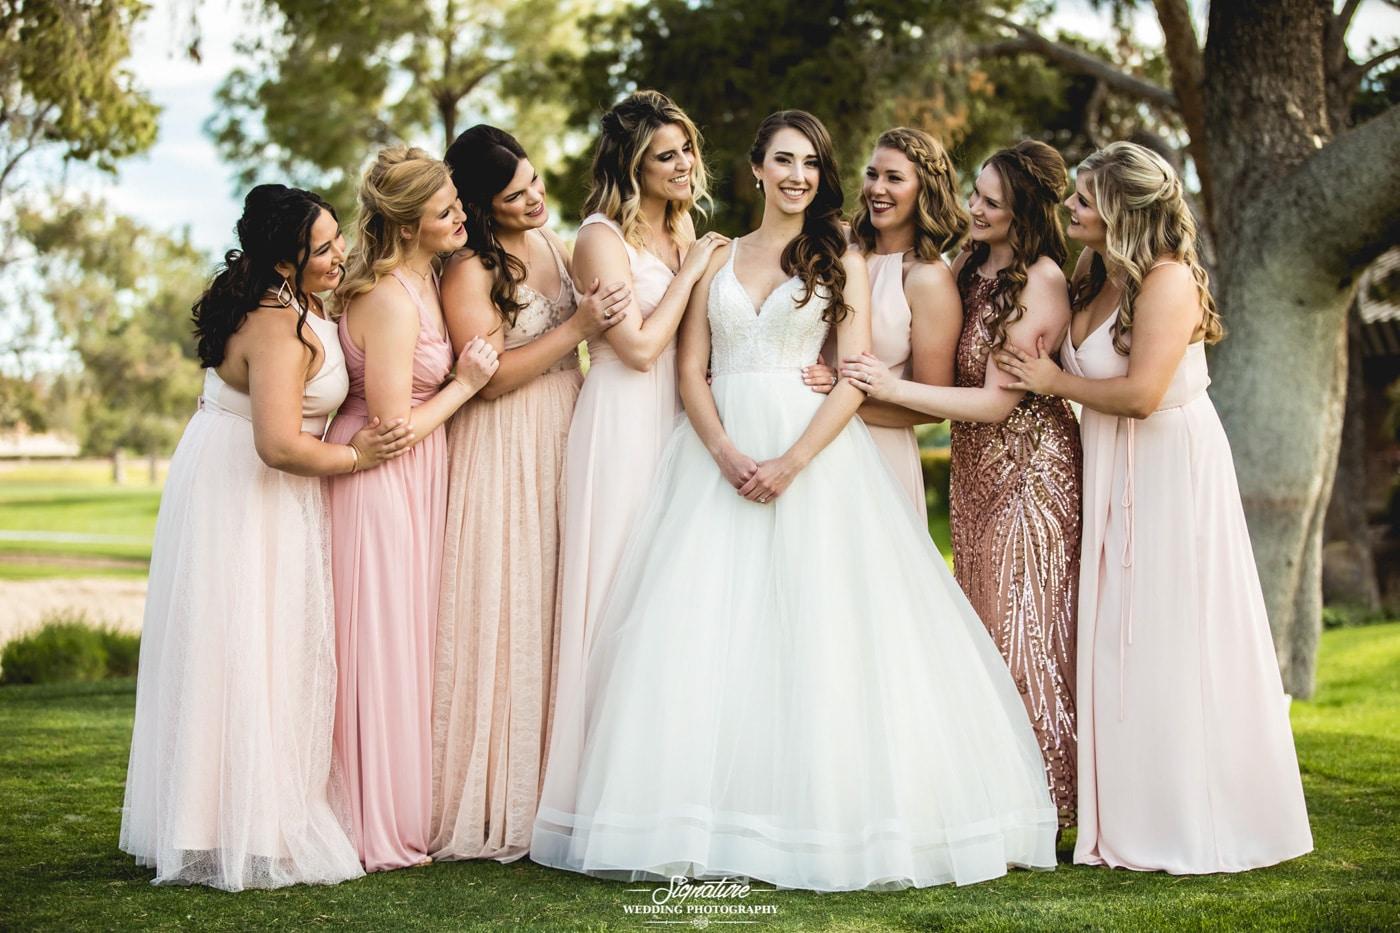 bride and bridesmaid photography 15